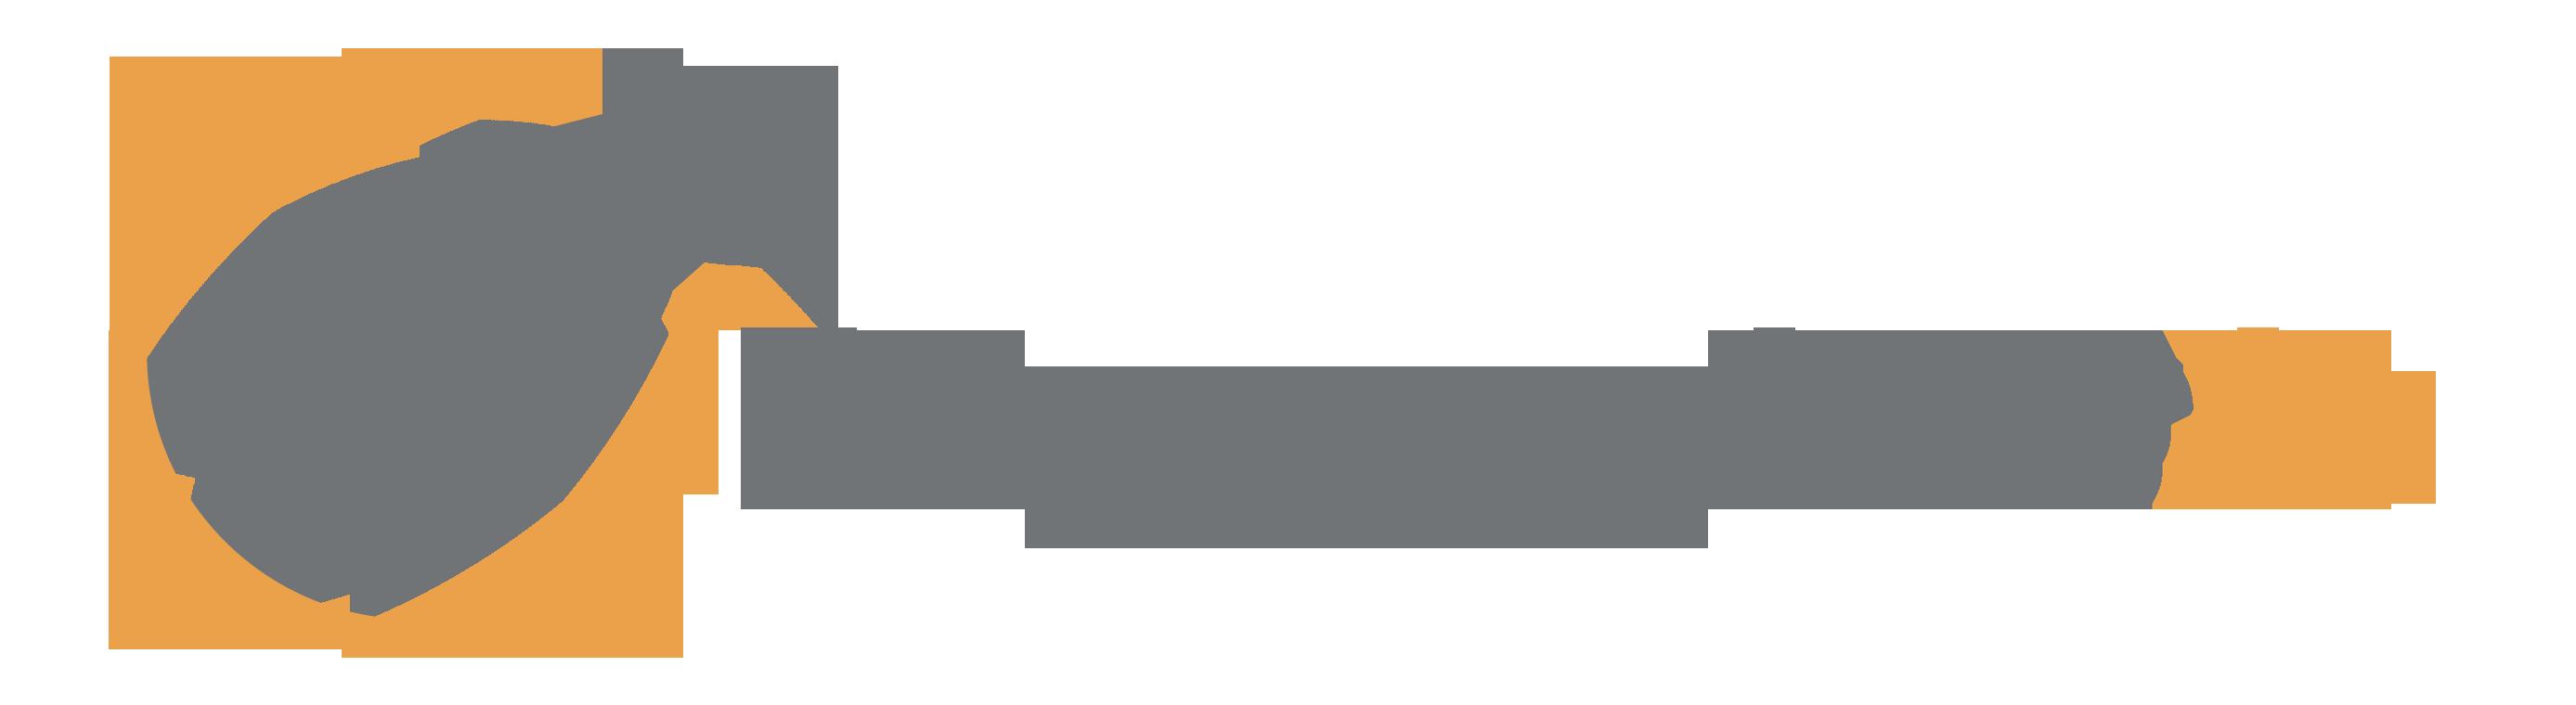 Transporters.Io Help Center